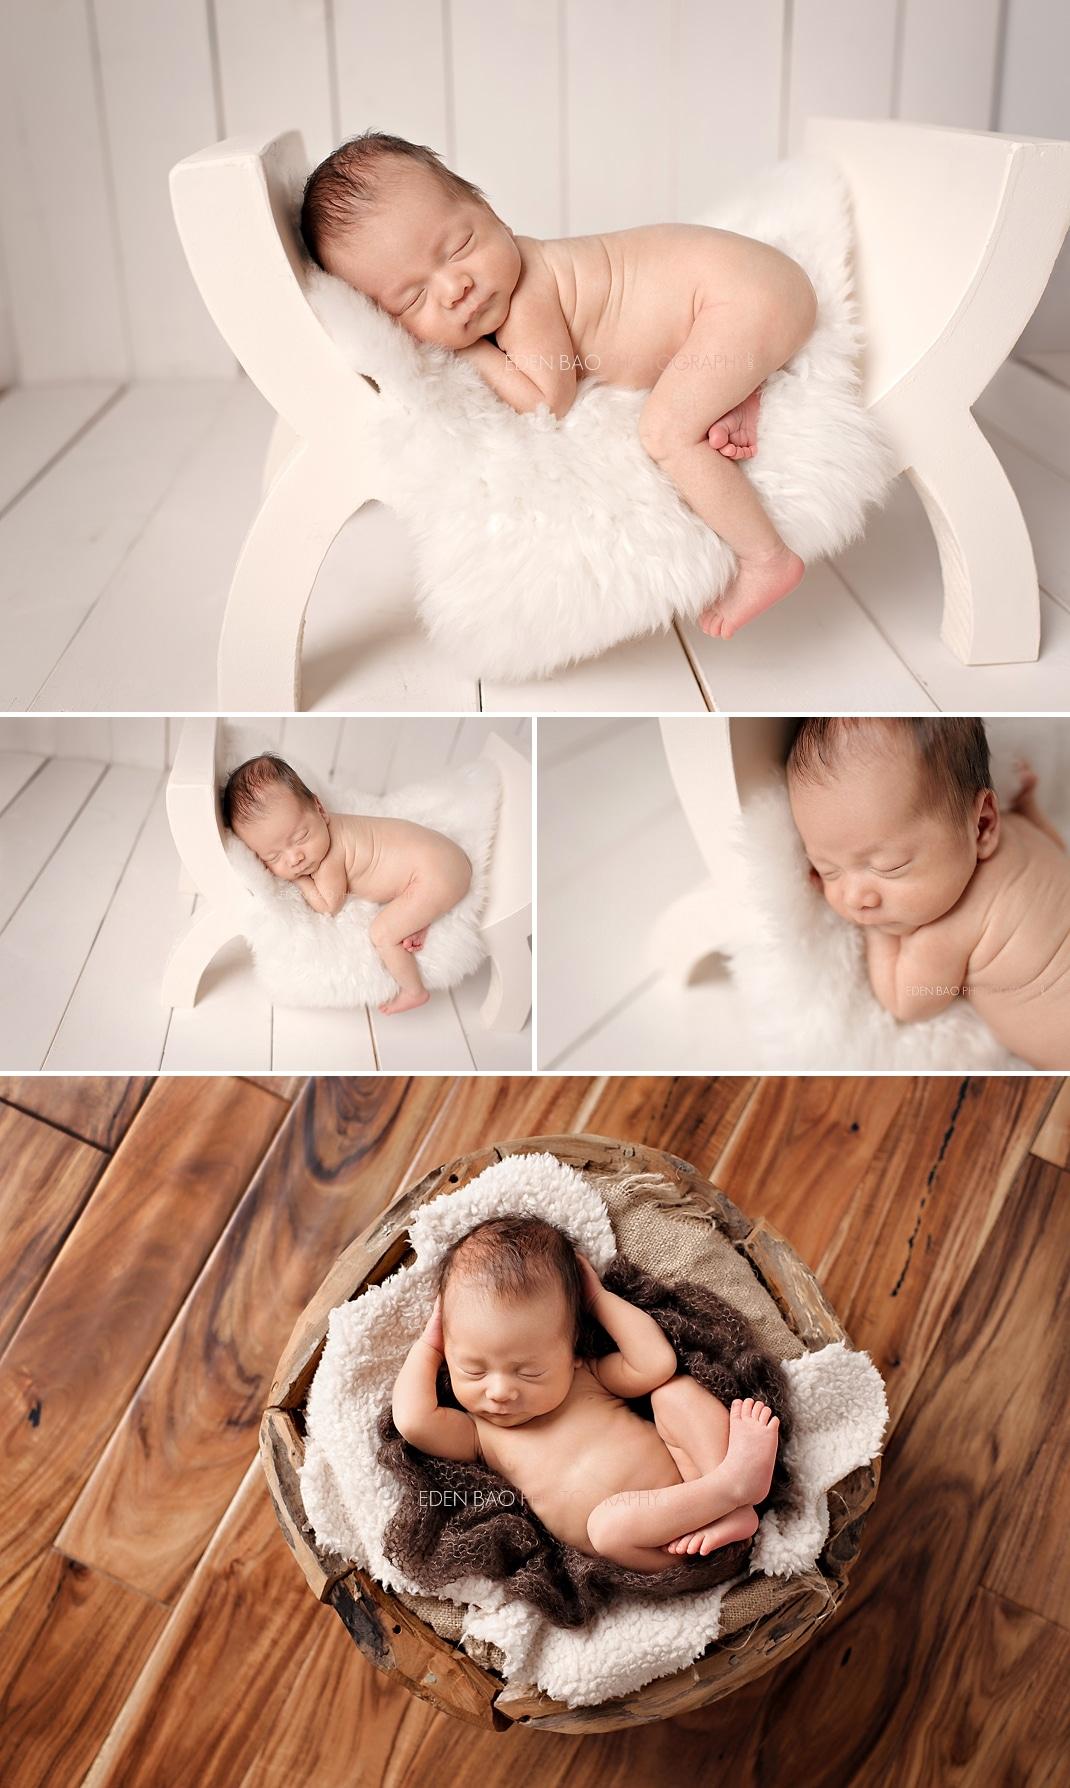 Richmond Vancouver BC Newborn Photographer Eden Bao Oliver neutral cream bench wood floor wooden bowl